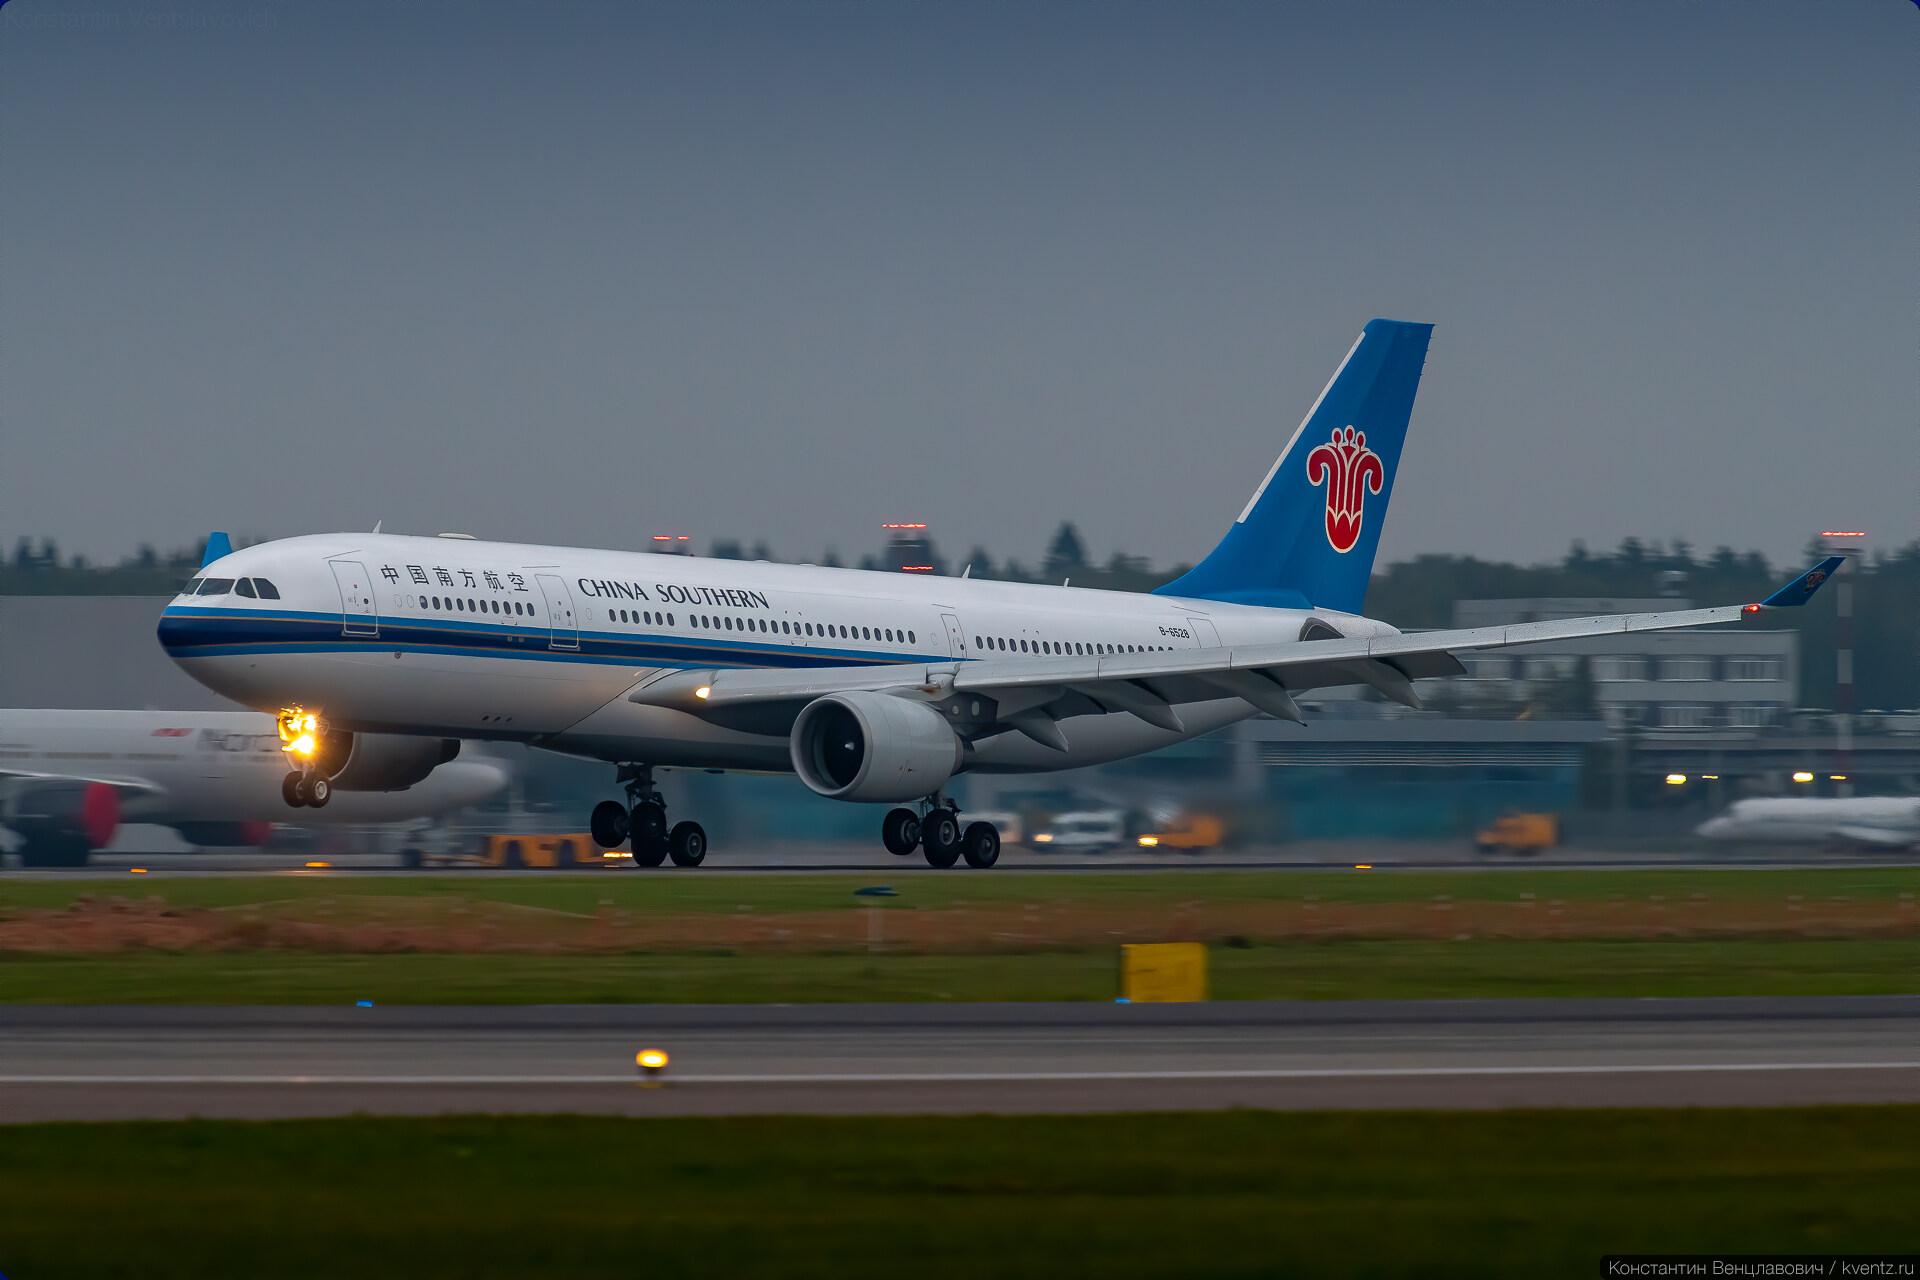 Airbus A330 B-6528 China Southern